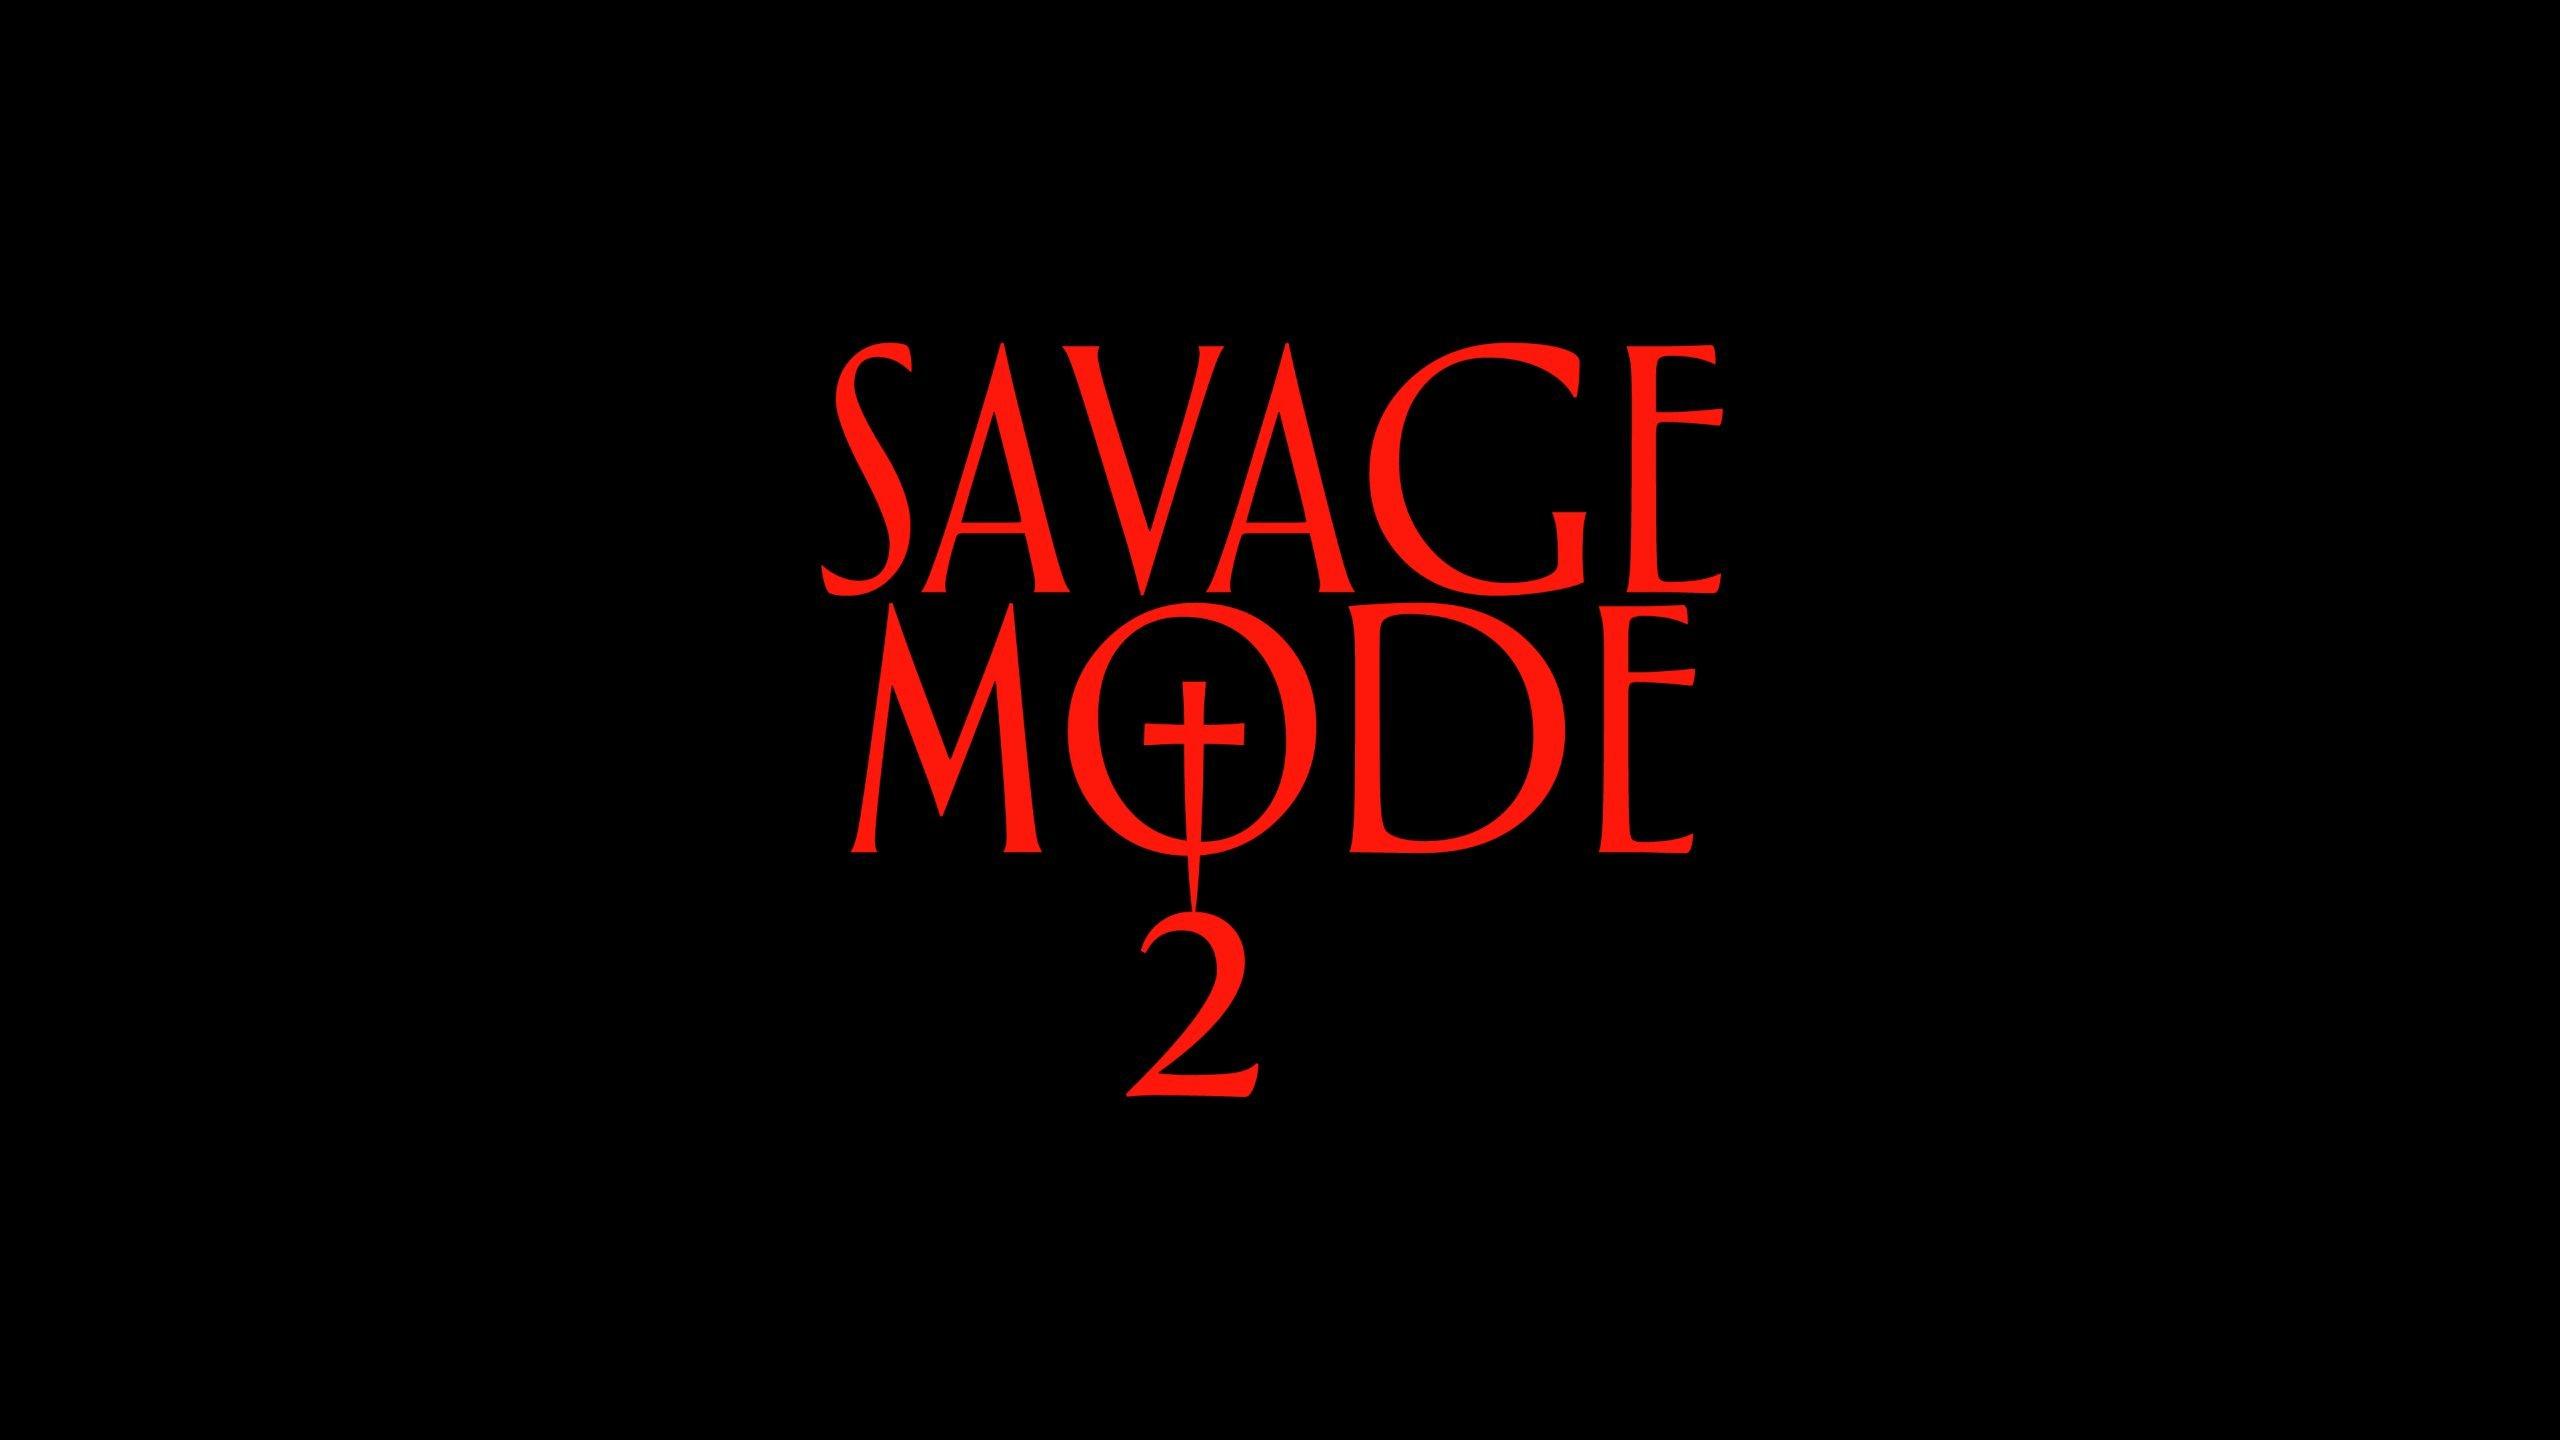 SAVAGE MODE II-merch-product 4 slider-02